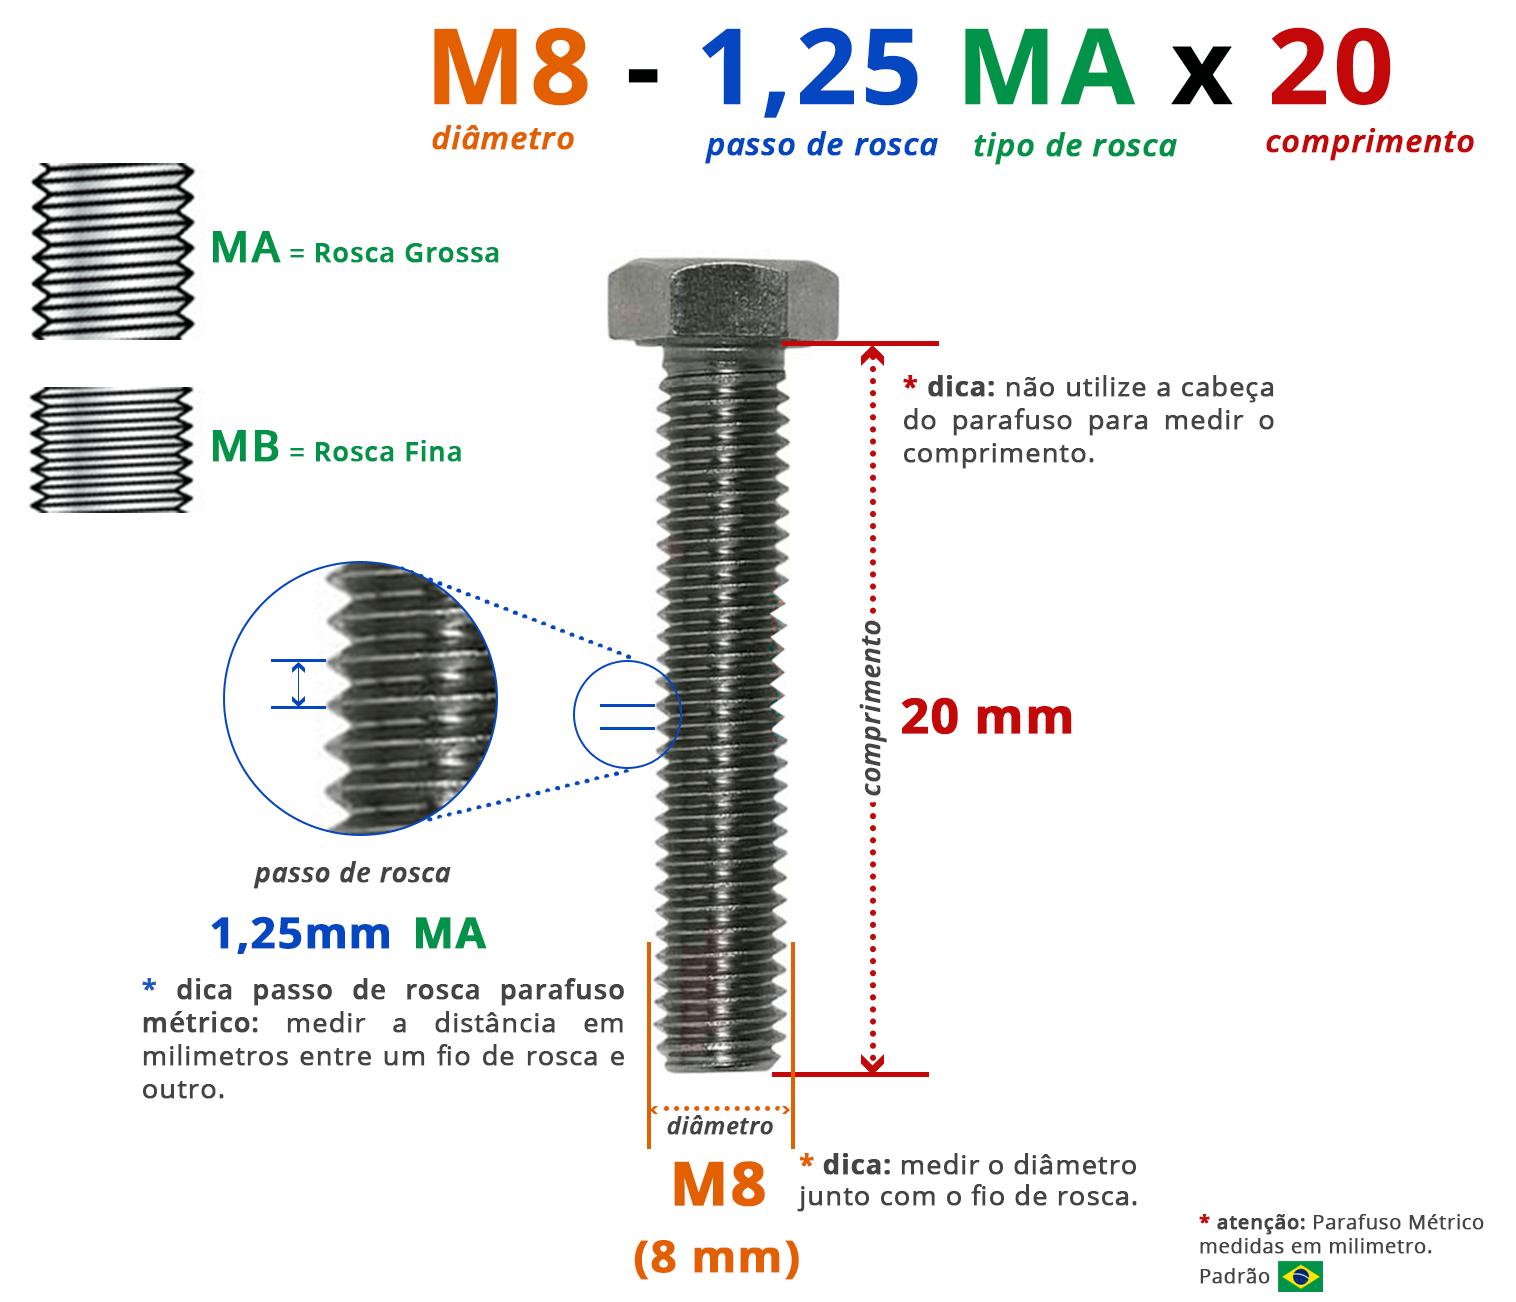 PARAFUSO SEXTAVADO ROSCA INTEIRA M8 1,25 MA X 20 DIN 933 INOX A4